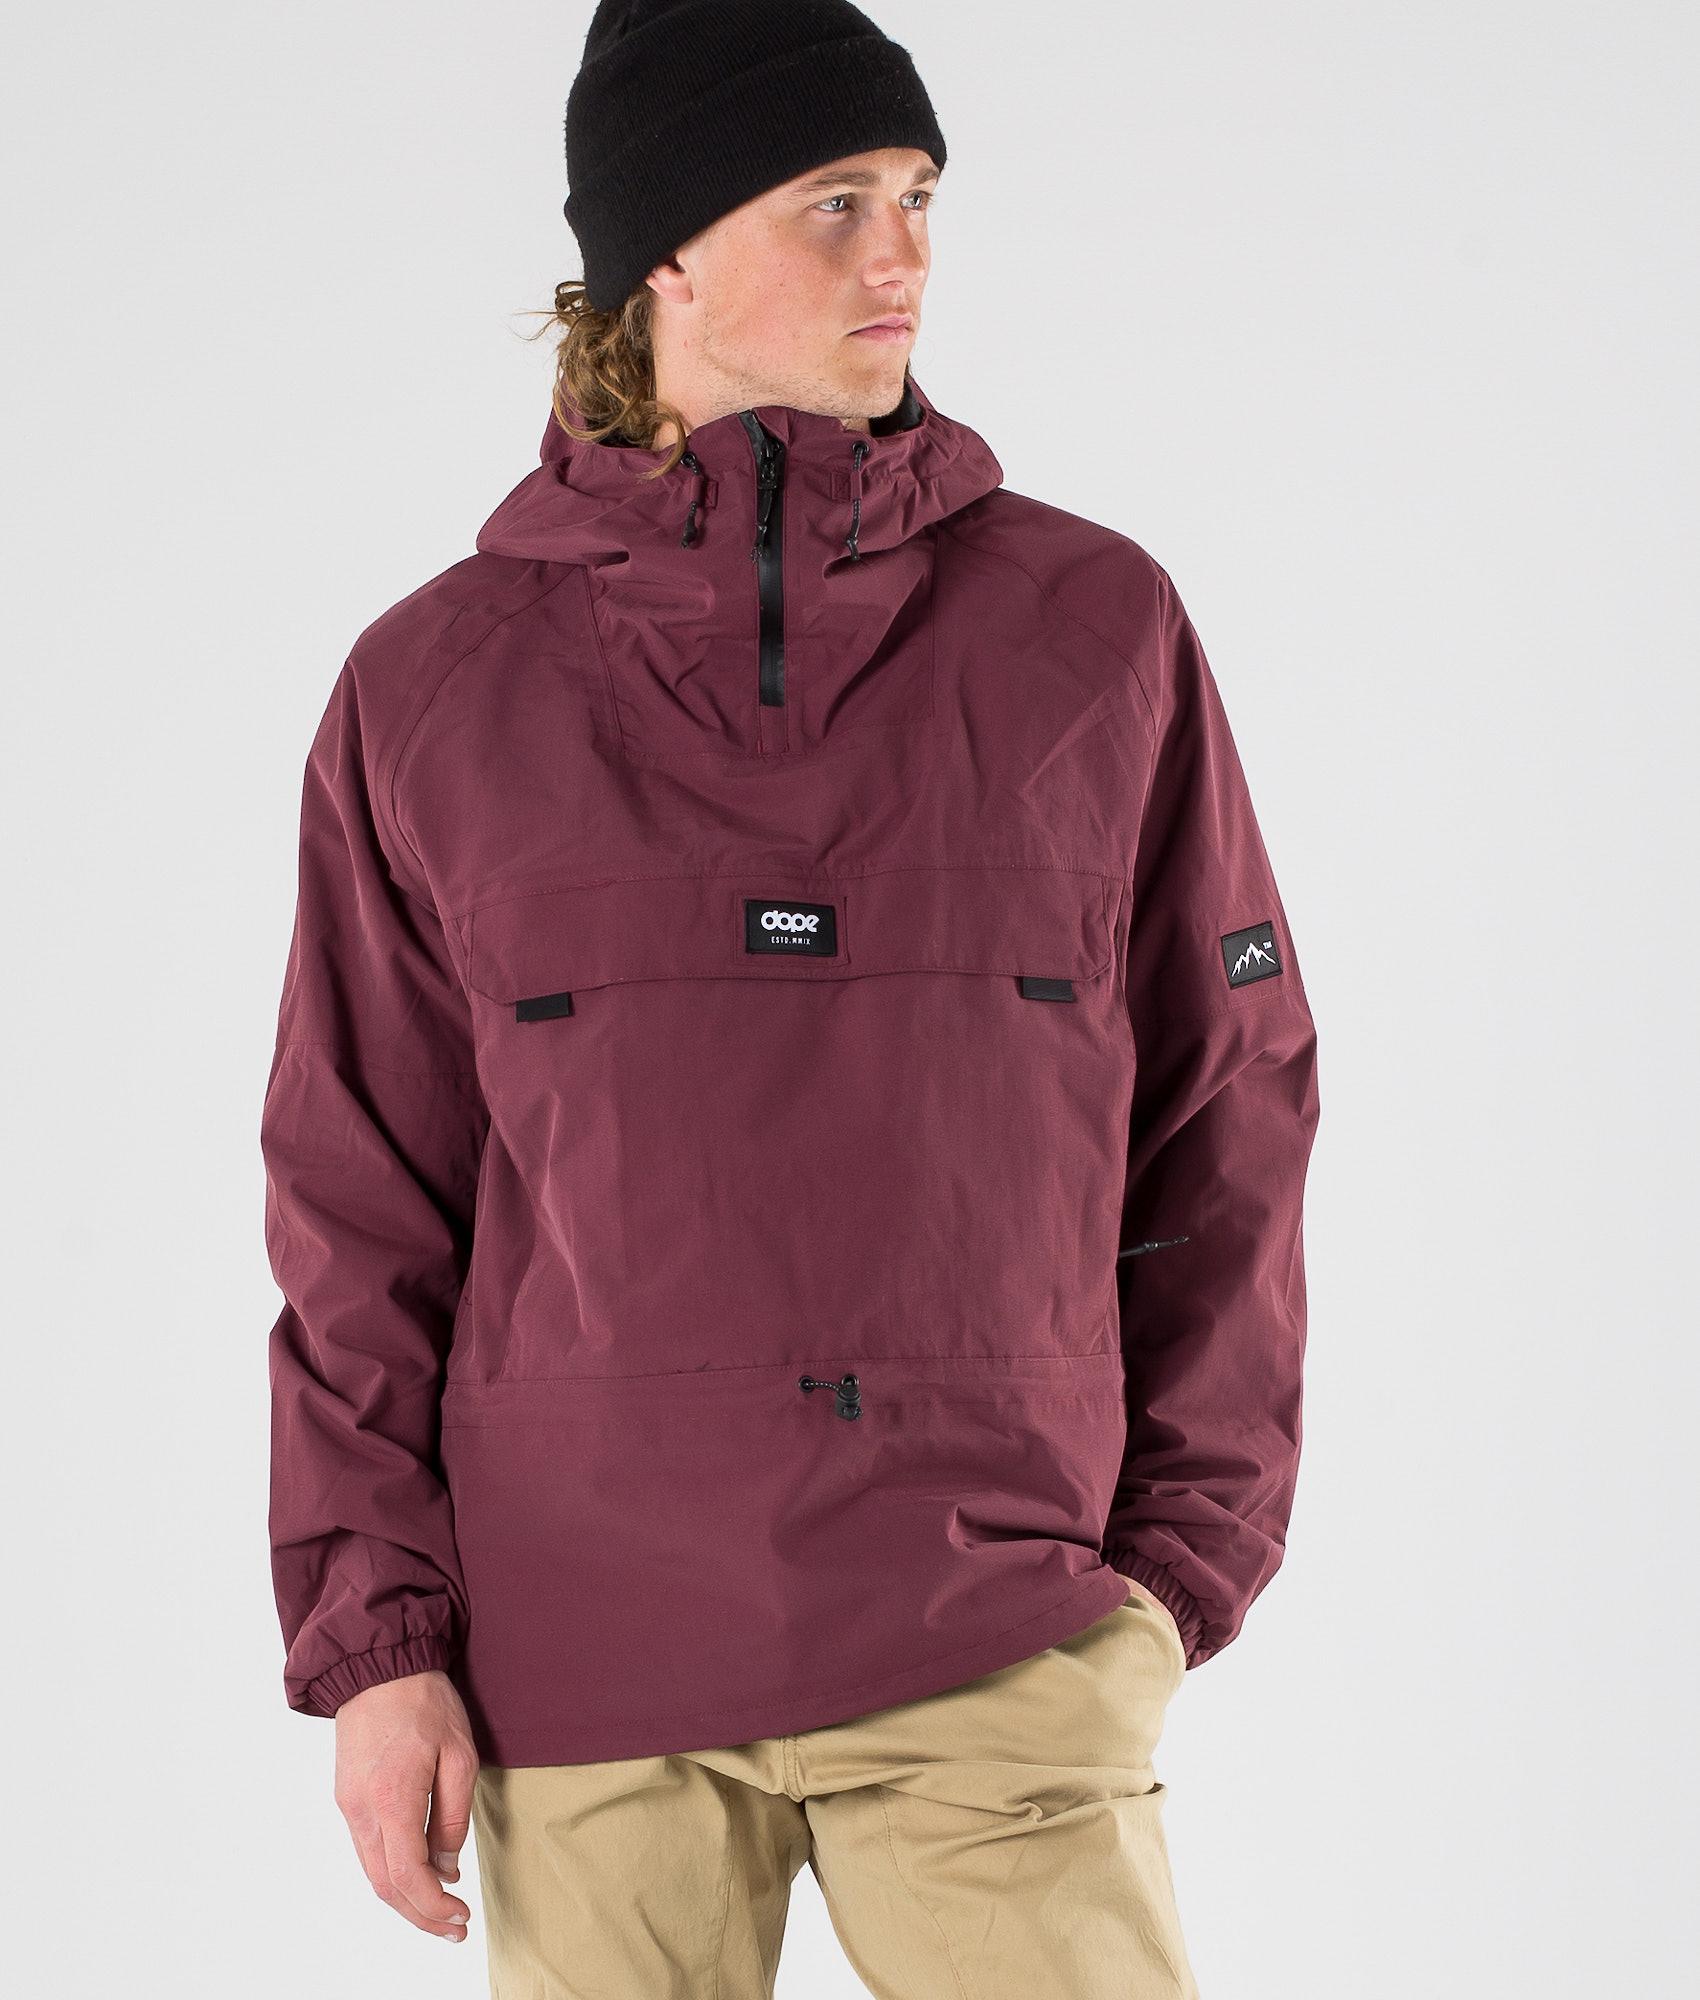 1be85f16 Jackor Herr Streetwear | Fri Frakt | Ridestore.se